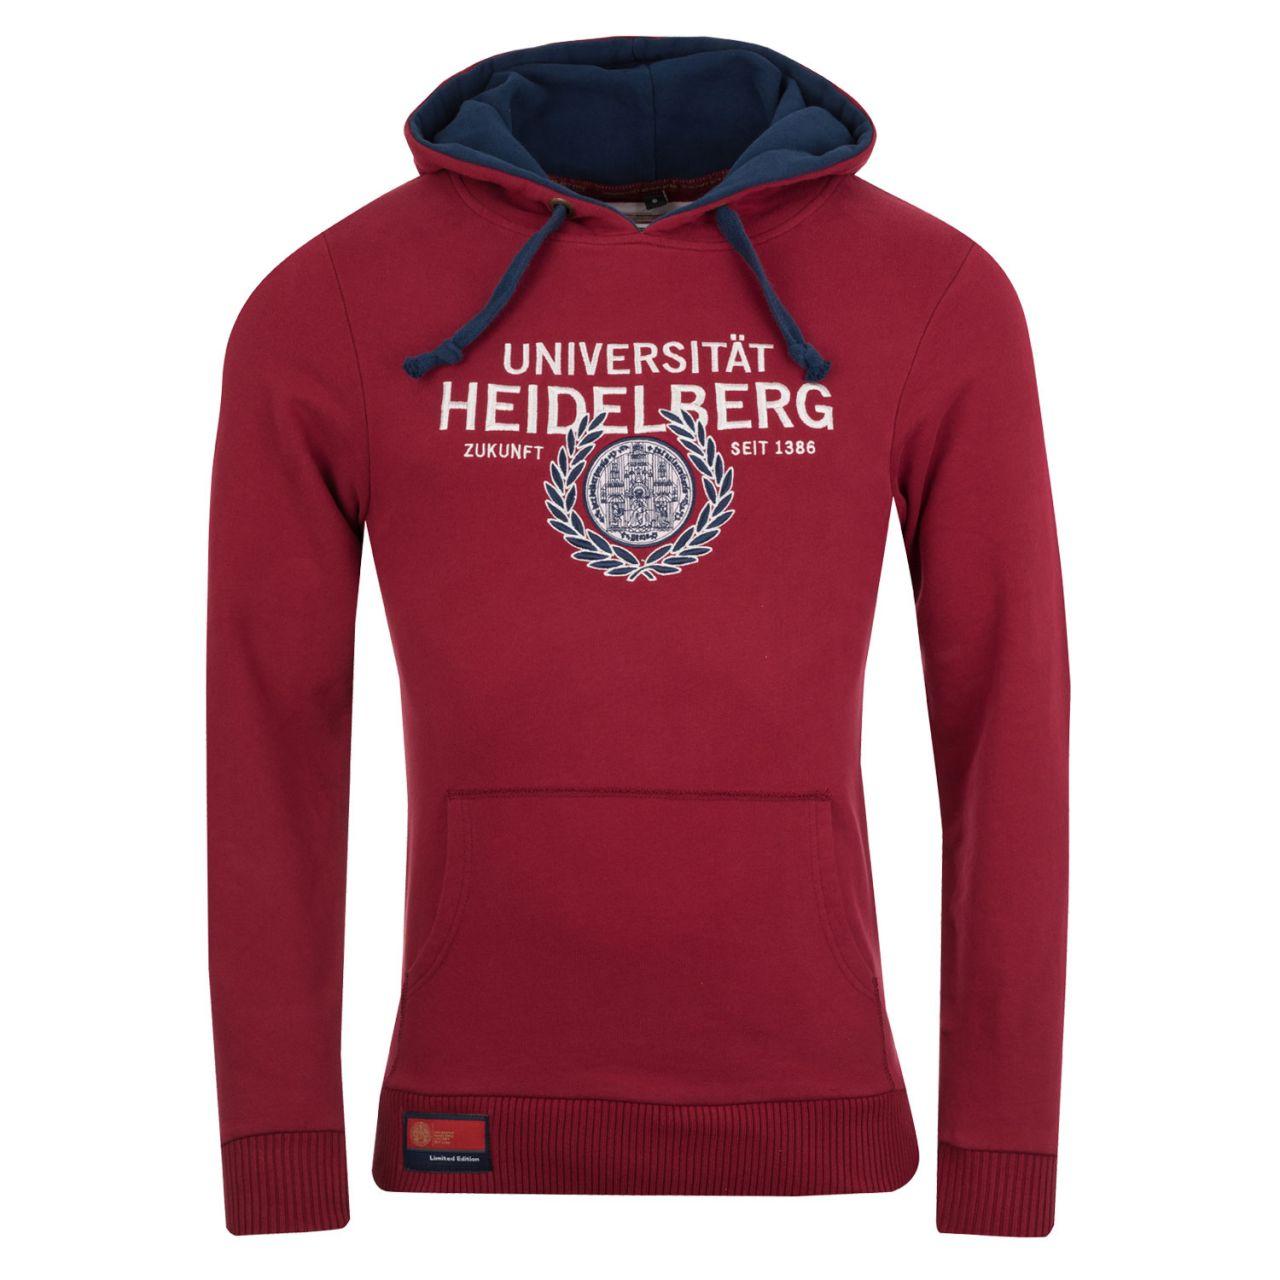 Limited Hooded Sweatshirt, burgundy, exclusive